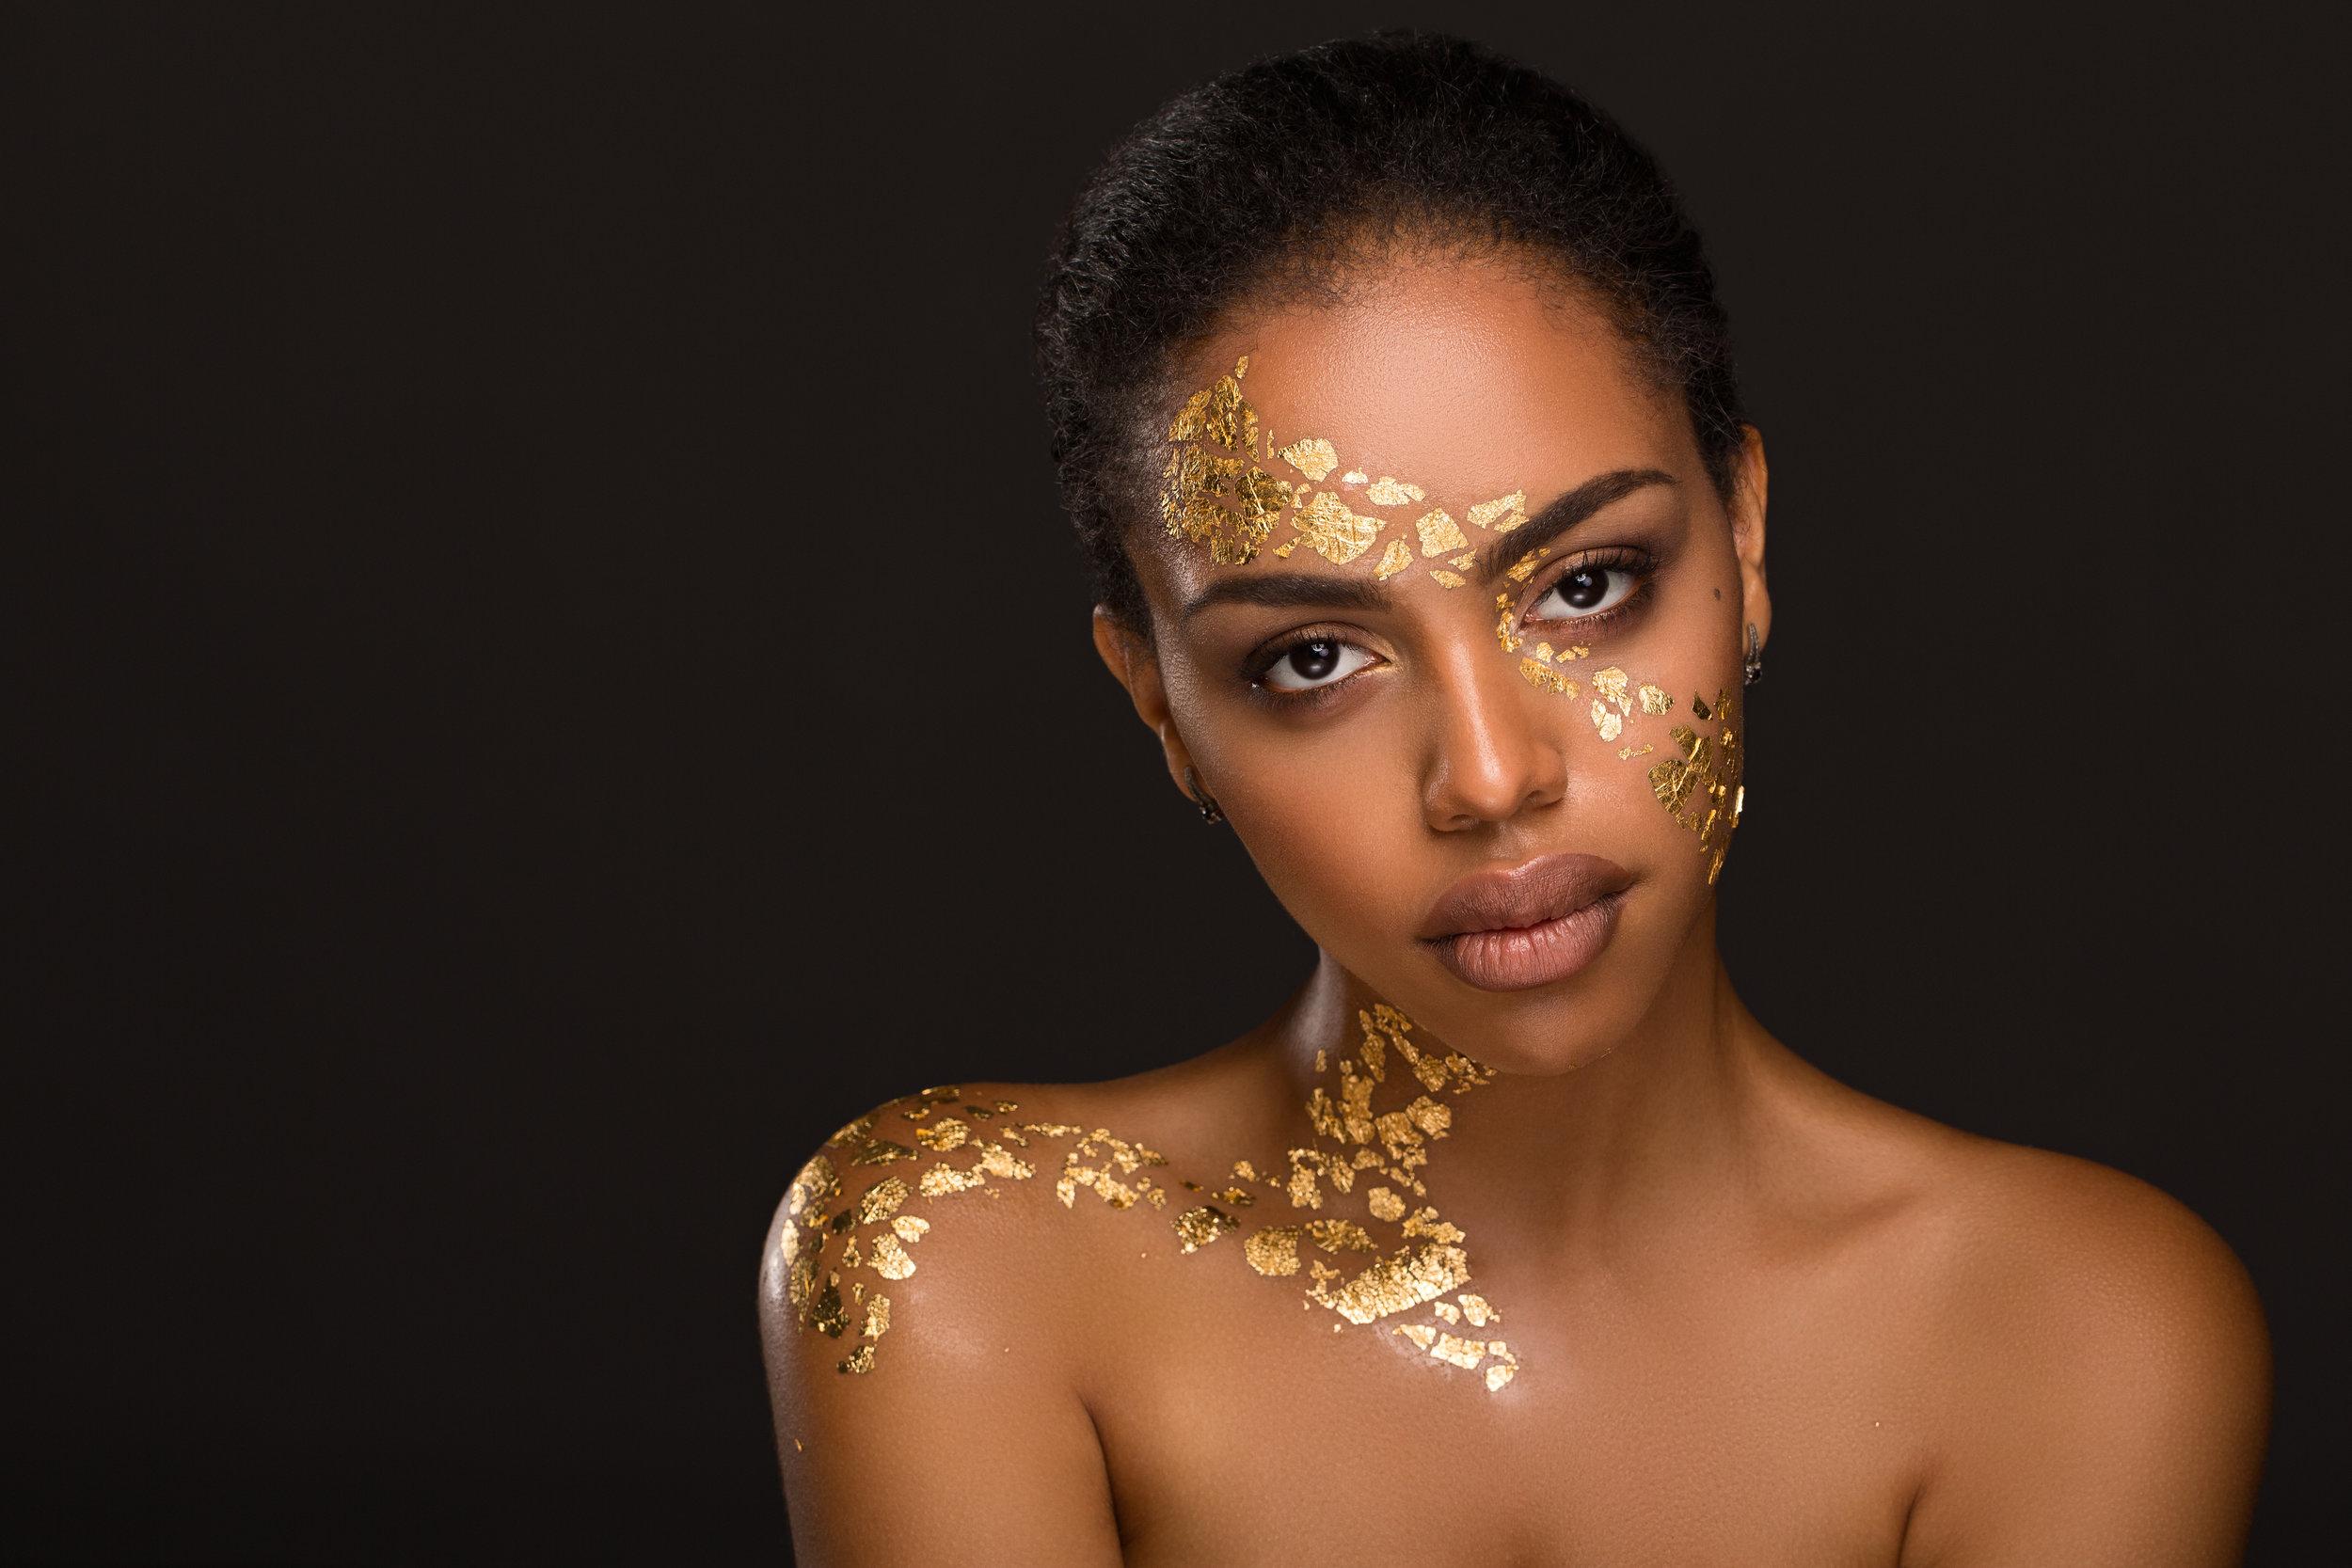 Beautiful young black woman with makeup